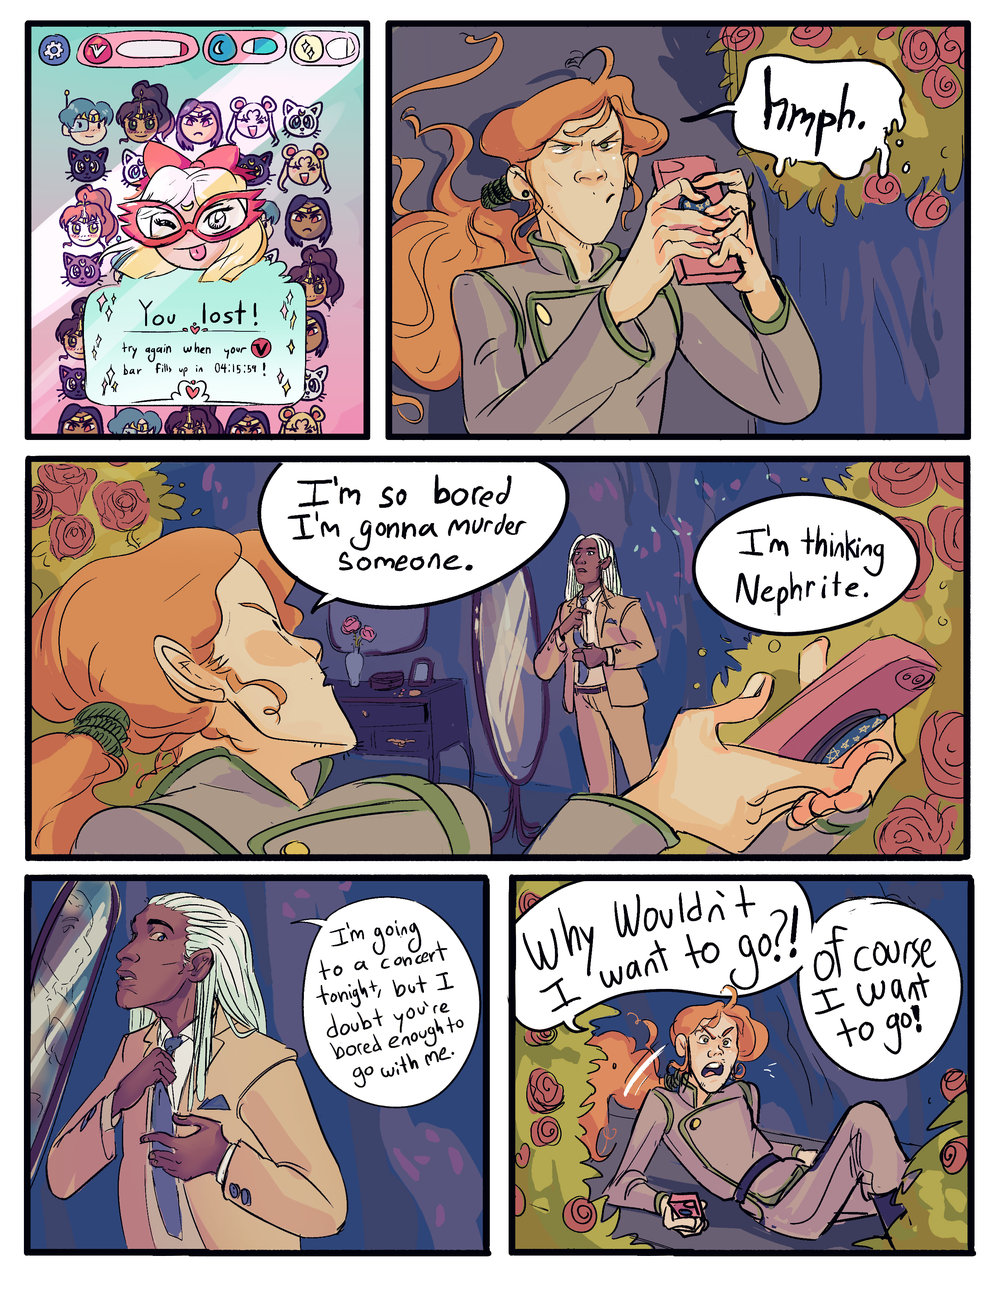 sailor moon tribute comic, 2018